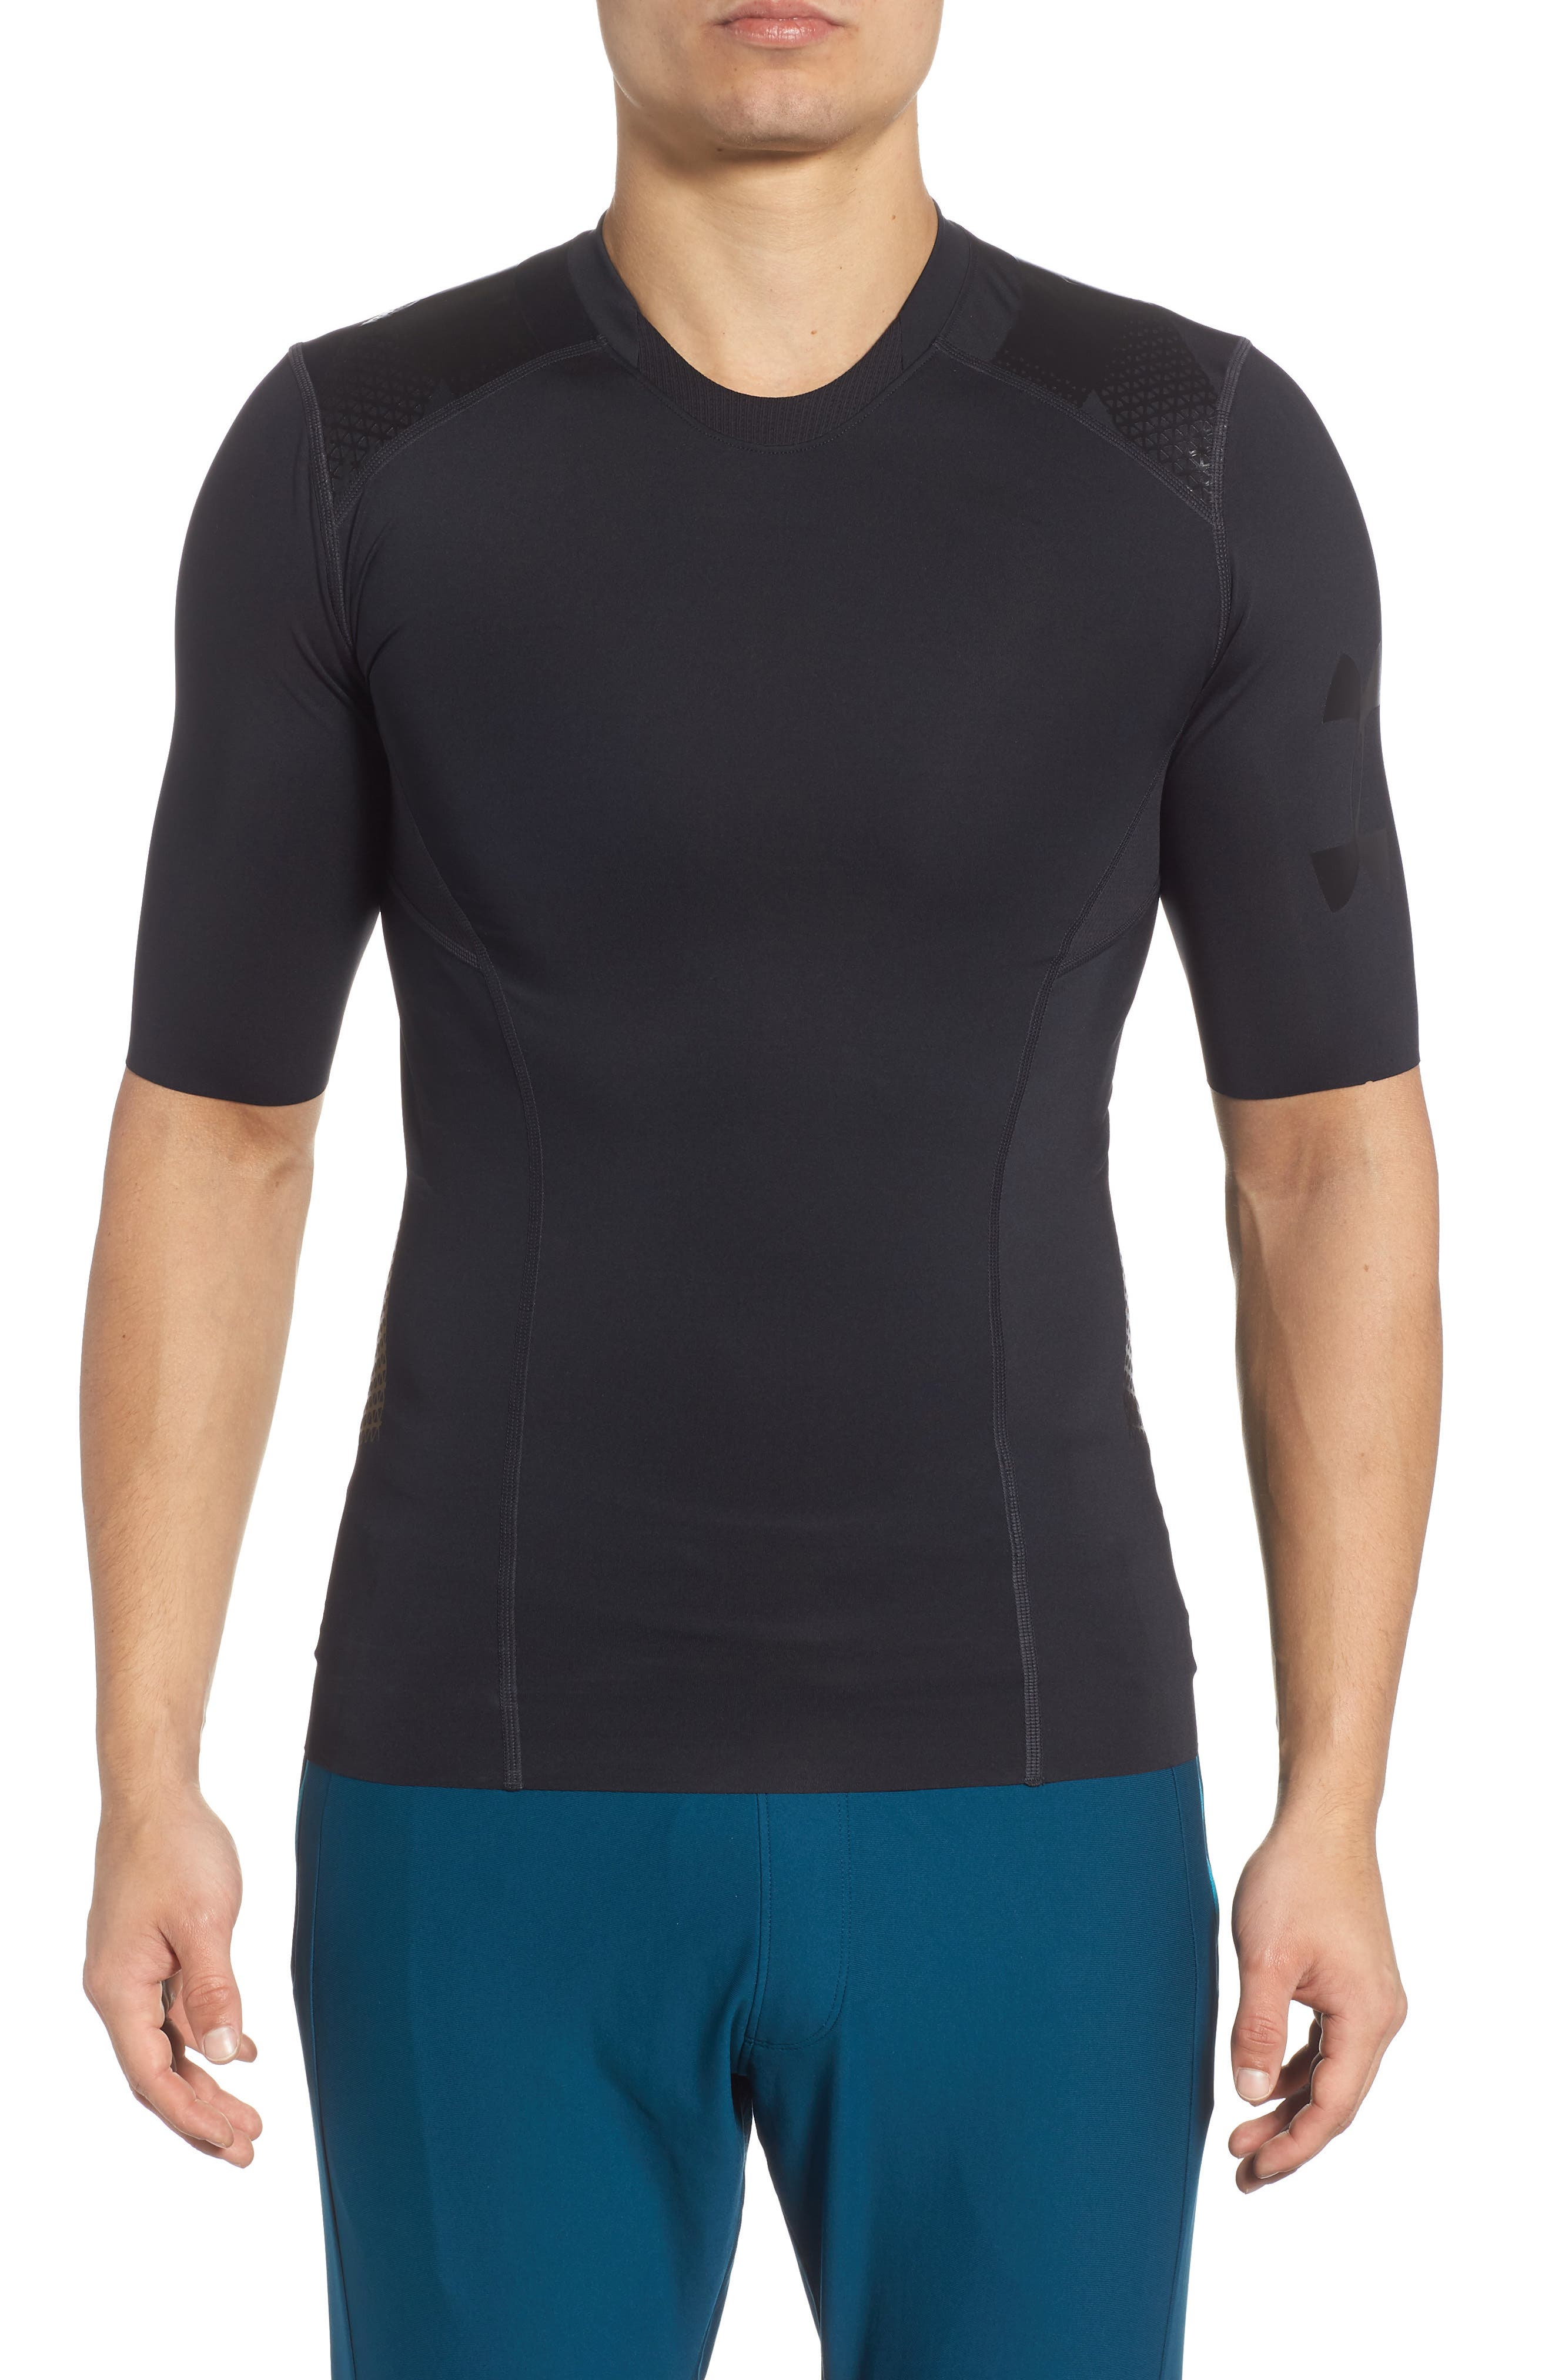 Perpetual Half Sleeve Fitted Shirt,                             Main thumbnail 1, color,                             BLACK